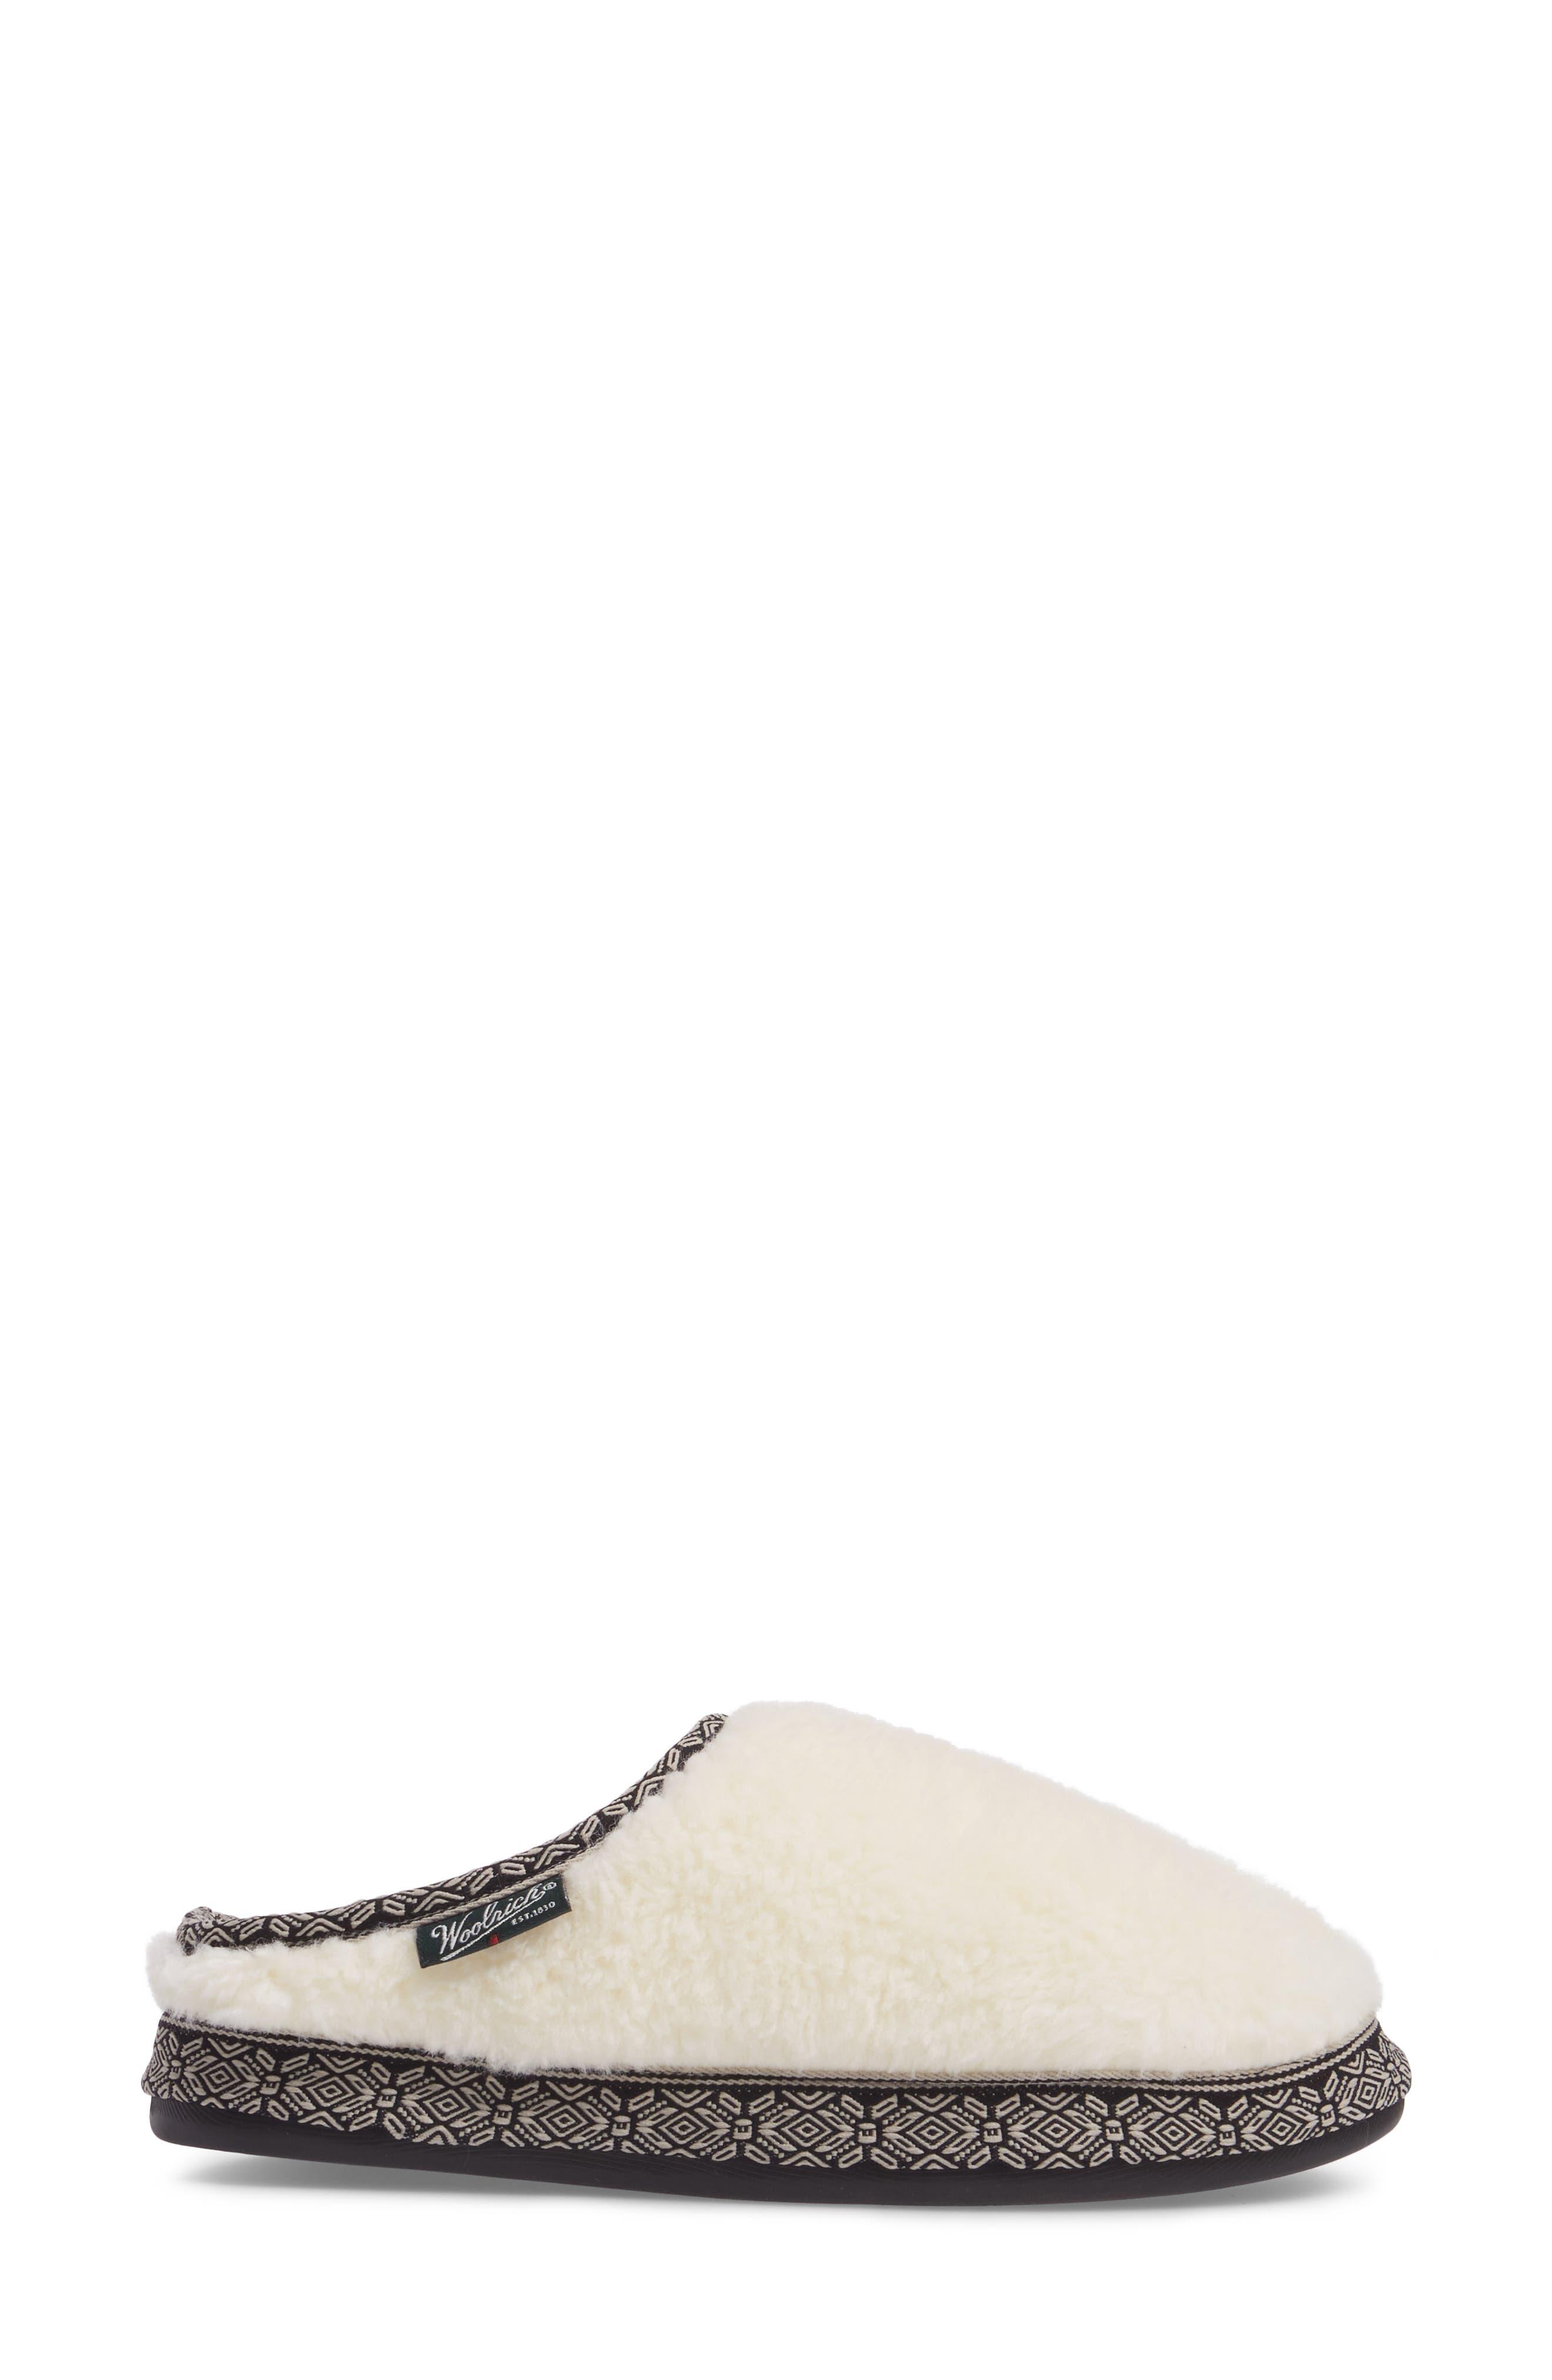 Whitecap Mule Slipper,                             Alternate thumbnail 3, color,                             Creampuff